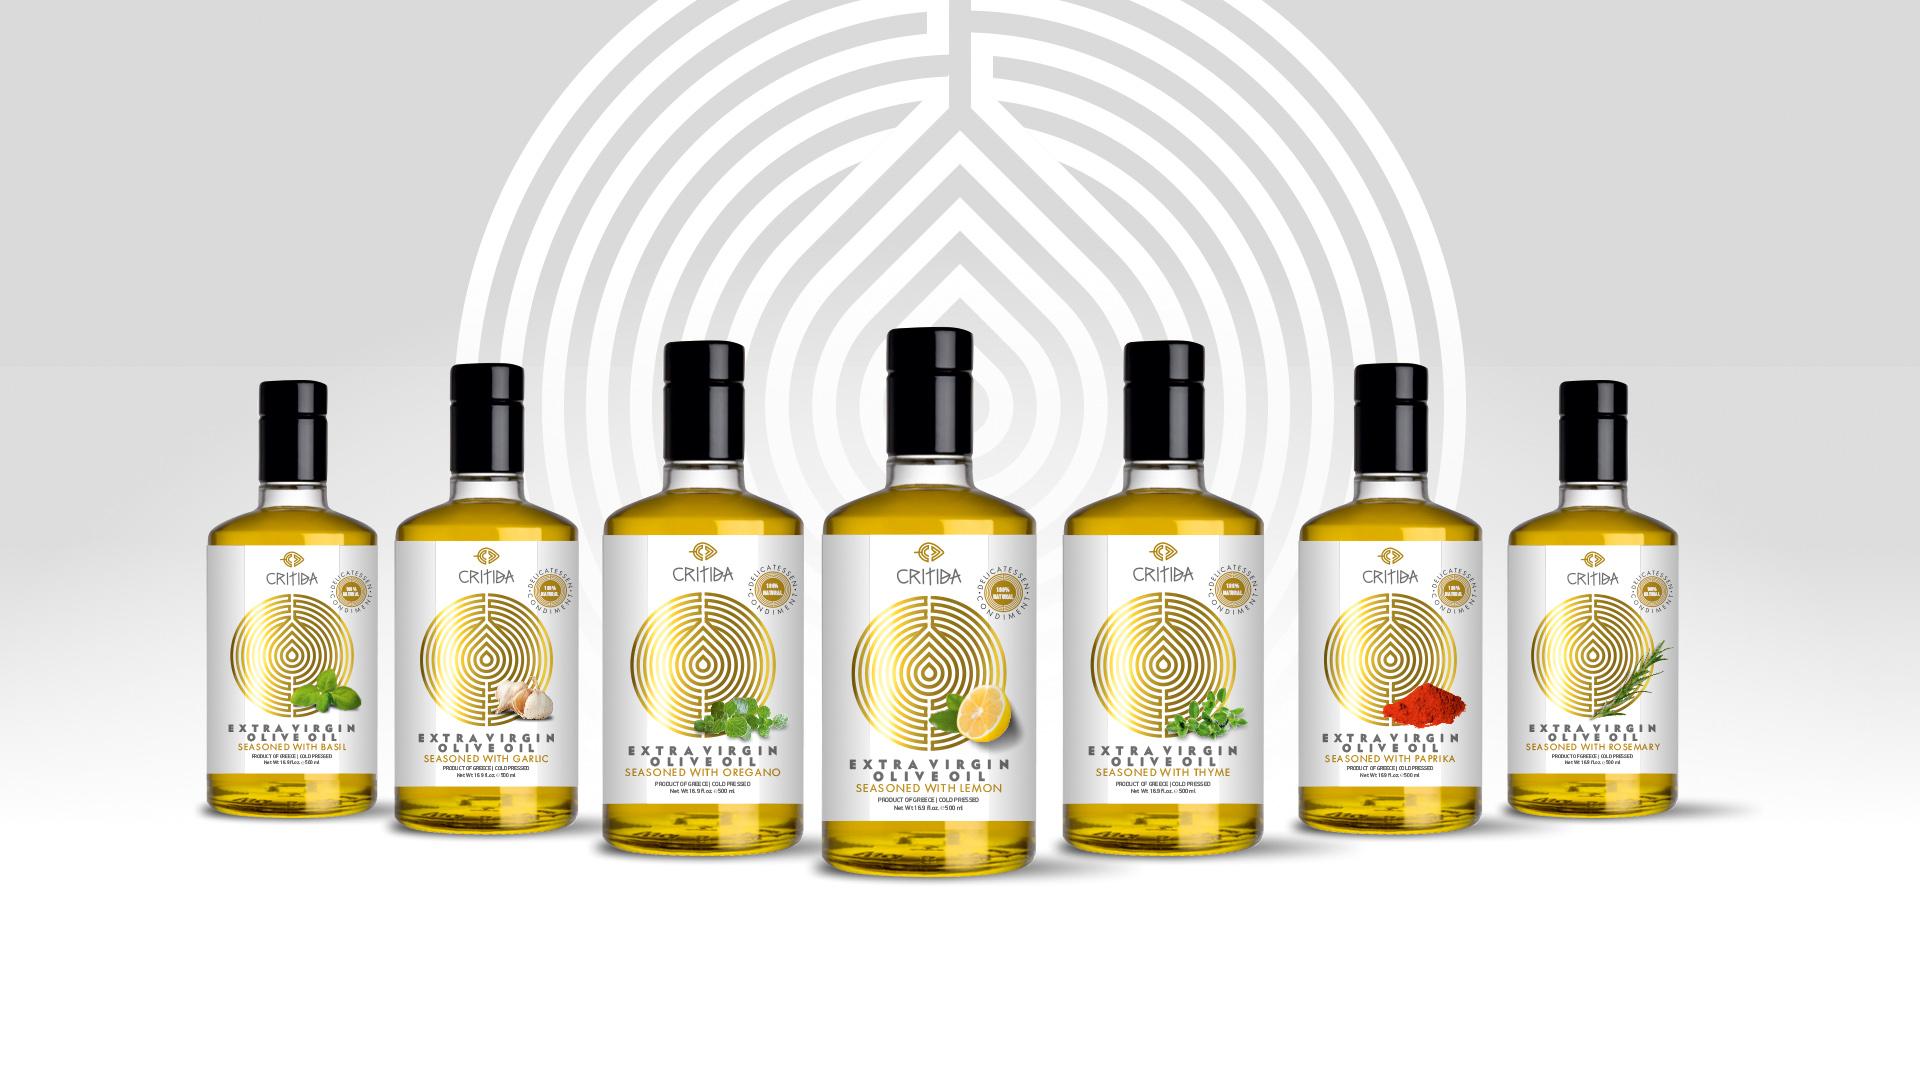 Critida extra virgin olive oil flavors